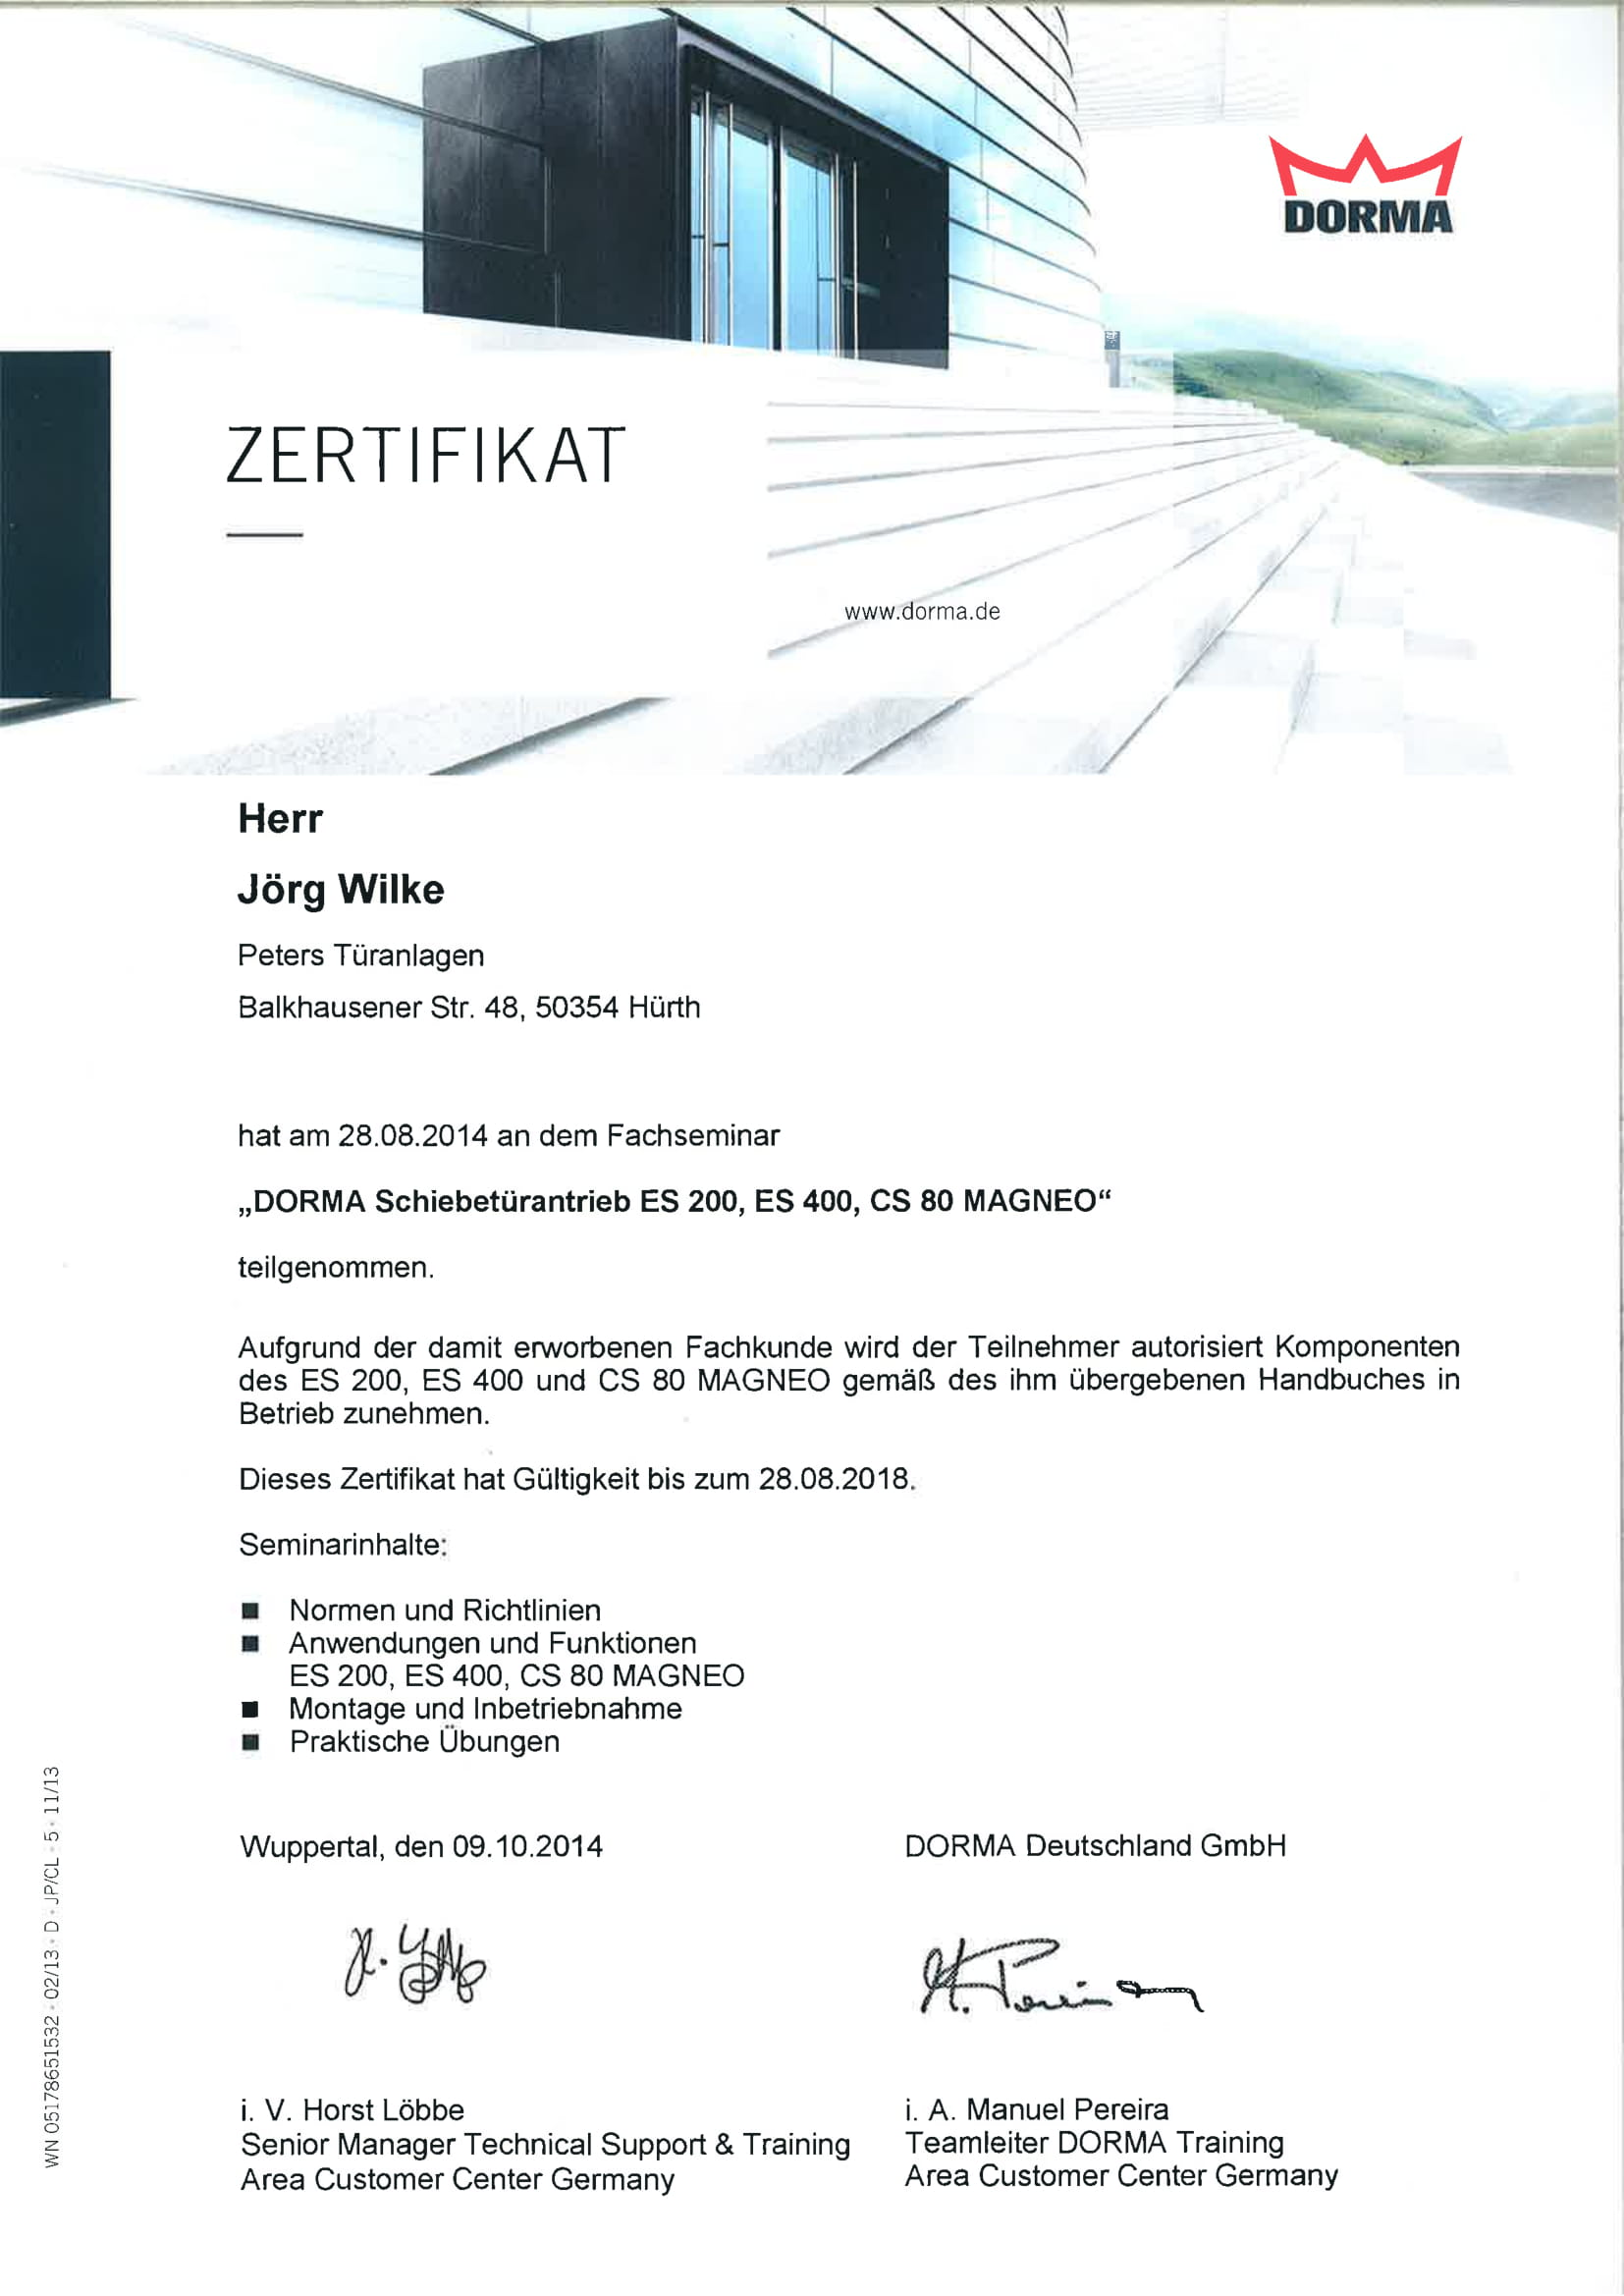 Zertifikat DORMA Schiebetürantrieb ES 200, ES 400, CS 80 MAGNEO